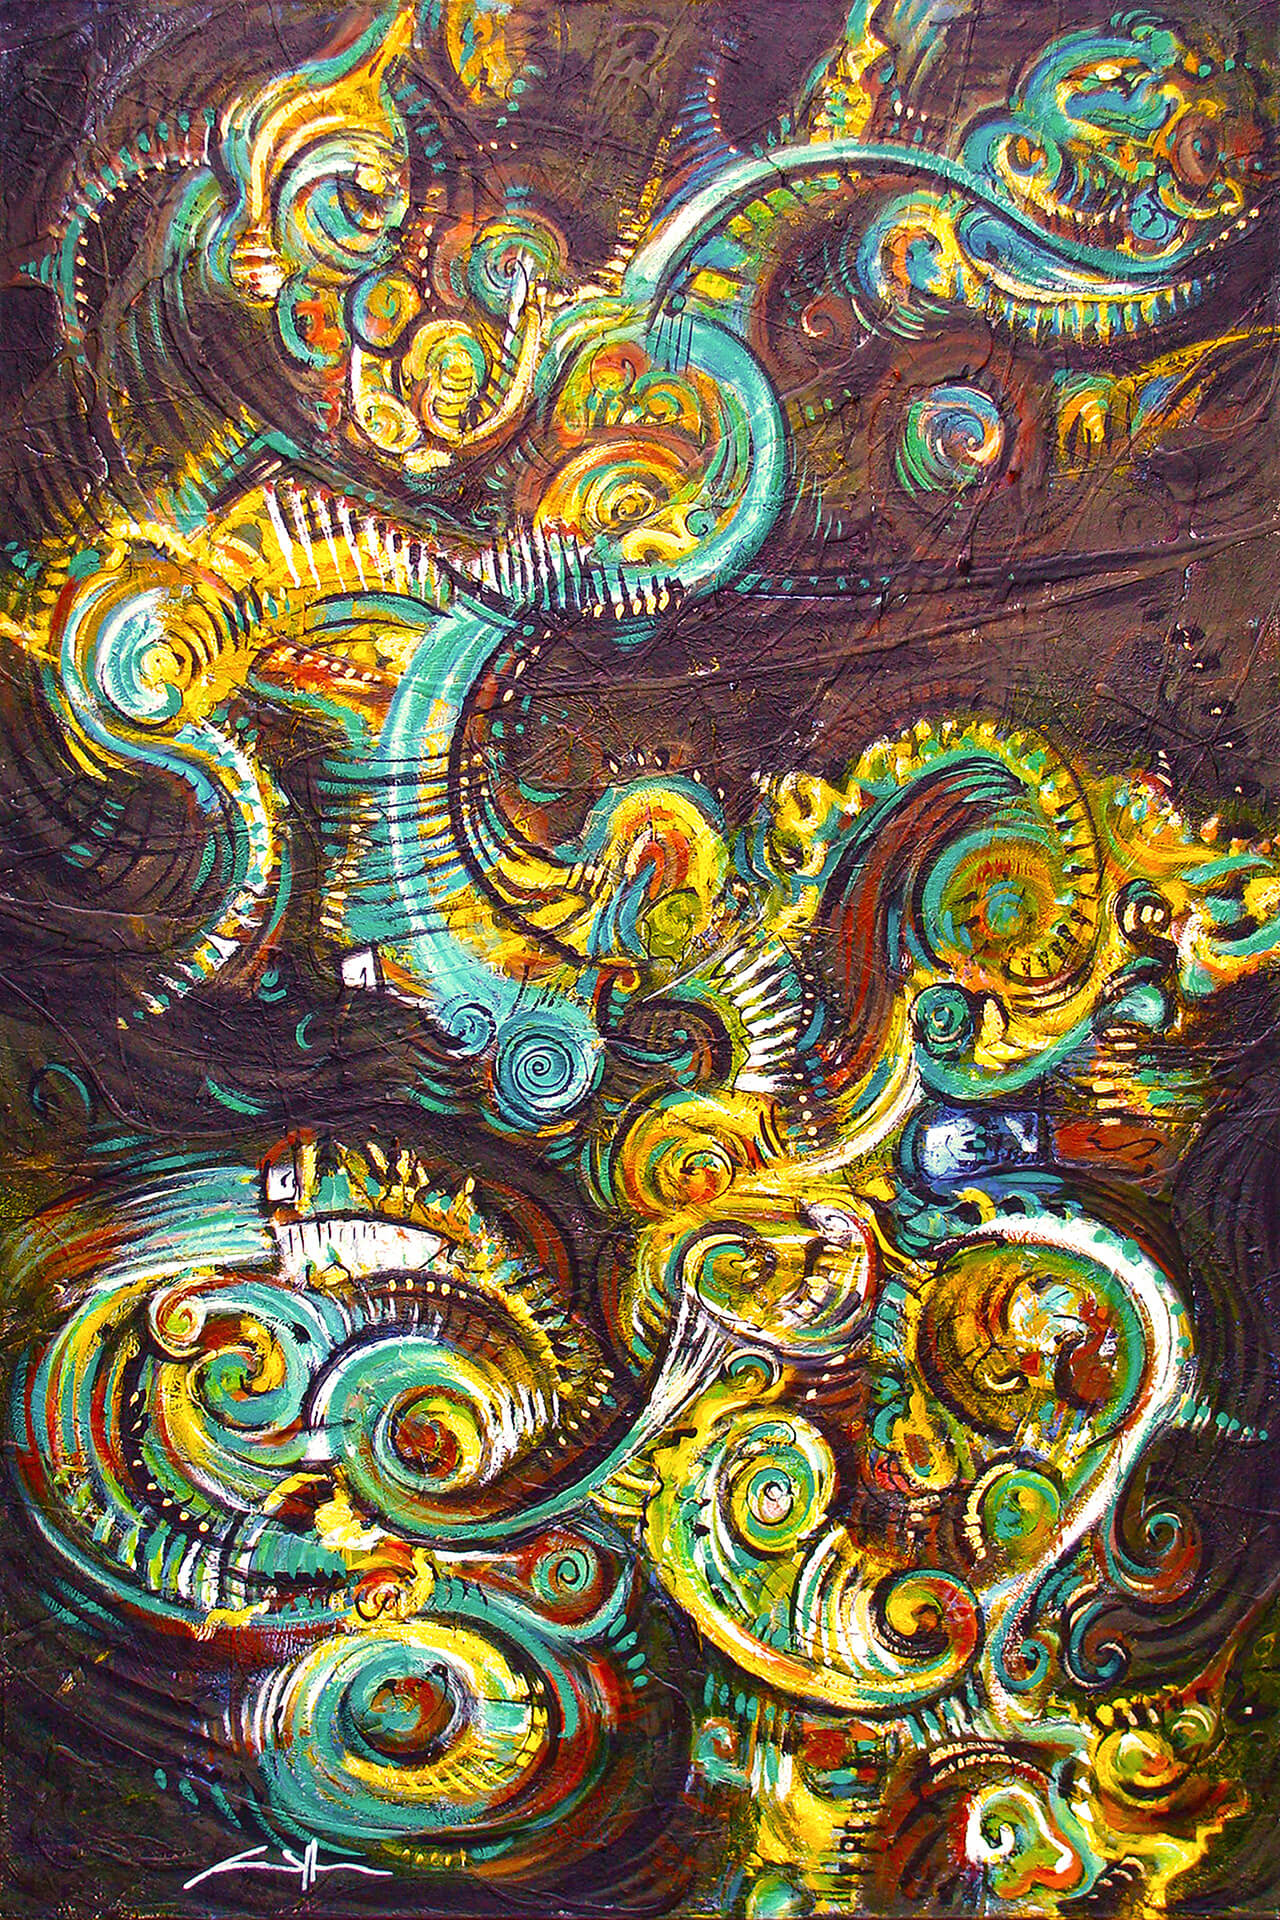 art-eric-j-hughes-artiste-peintre-canadien-tableau-delirium-cobrazilus